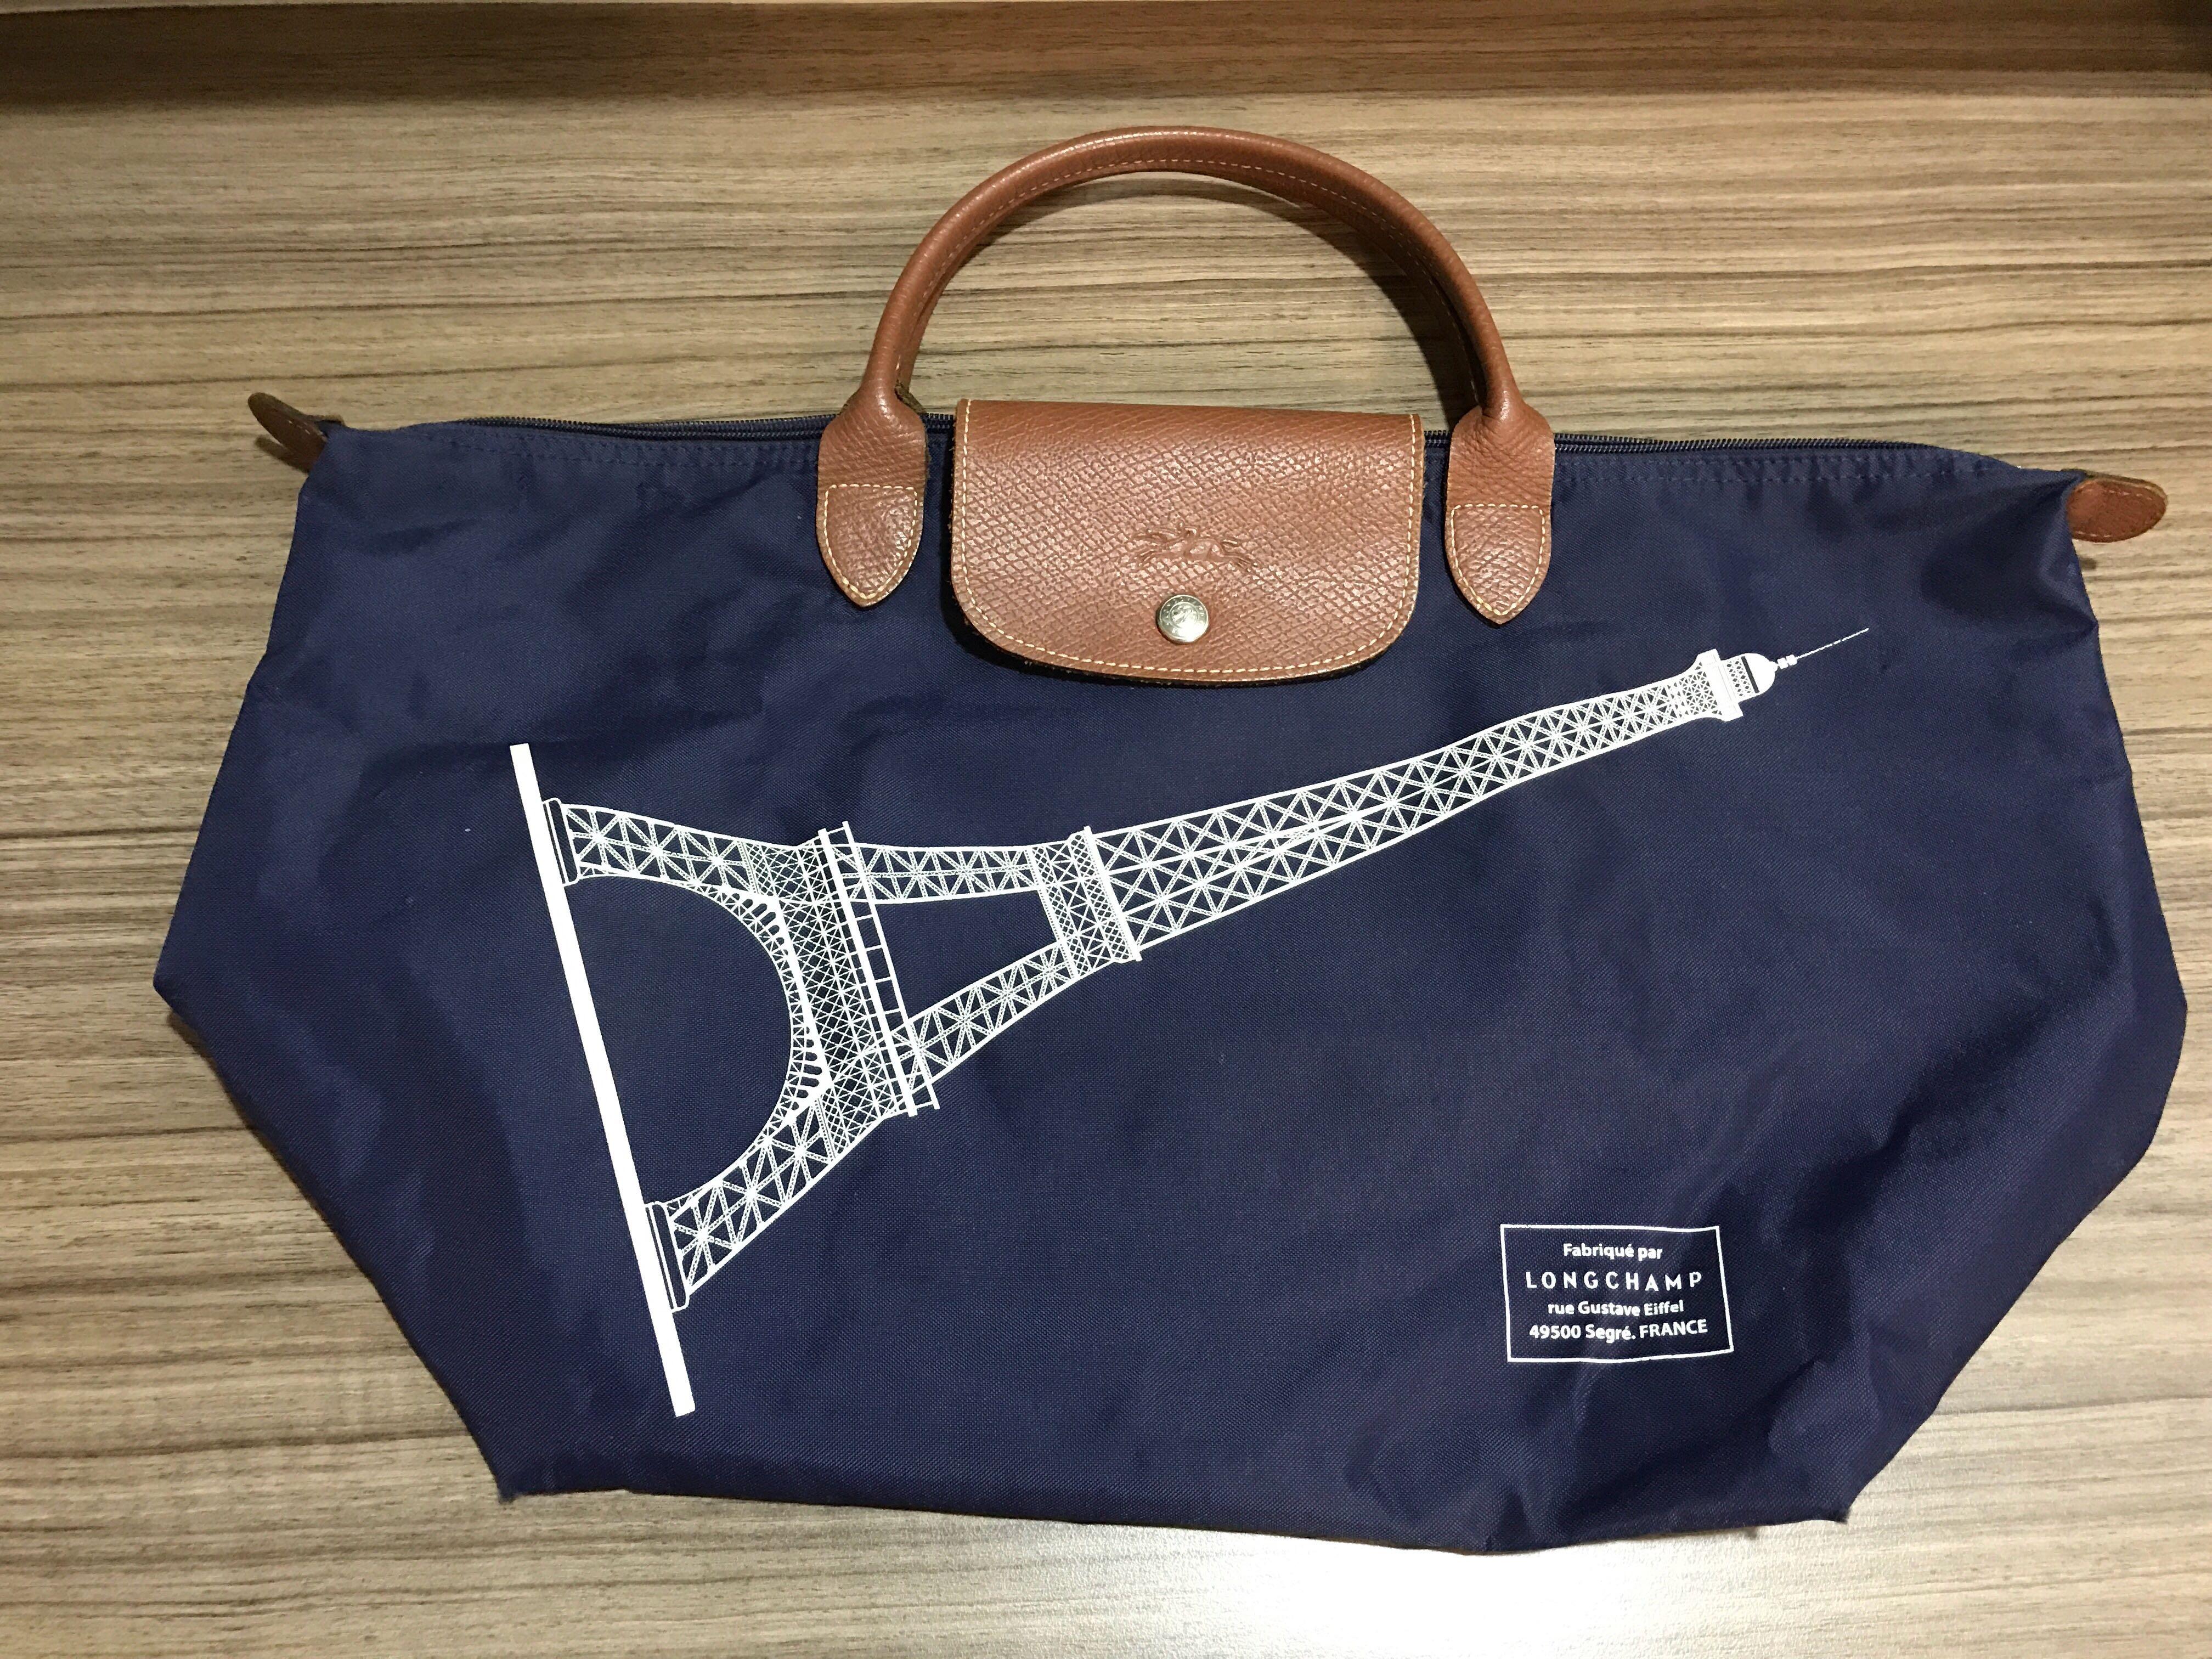 69f6a2357a Longchamp short handle tote bag (medium), Women's Fashion, Bags ...